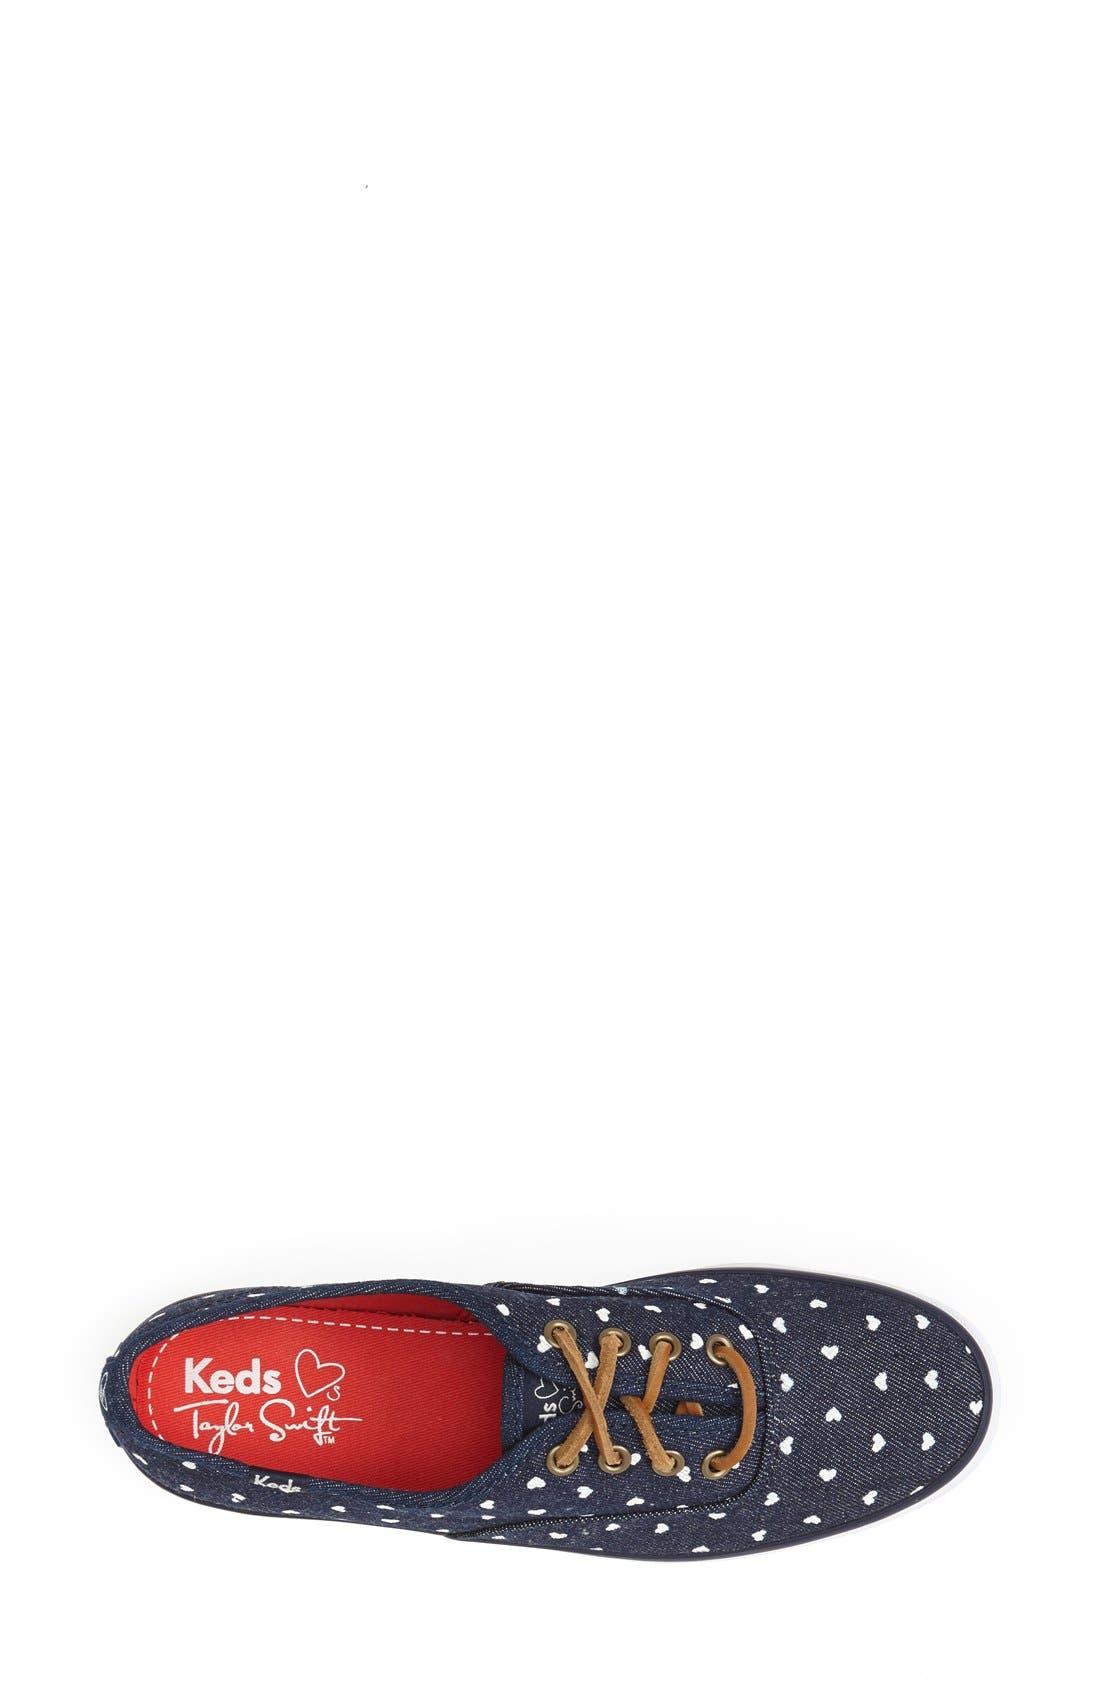 Alternate Image 3  - Keds® Taylor Swift 'Bleach Heart' Sneaker (Women)